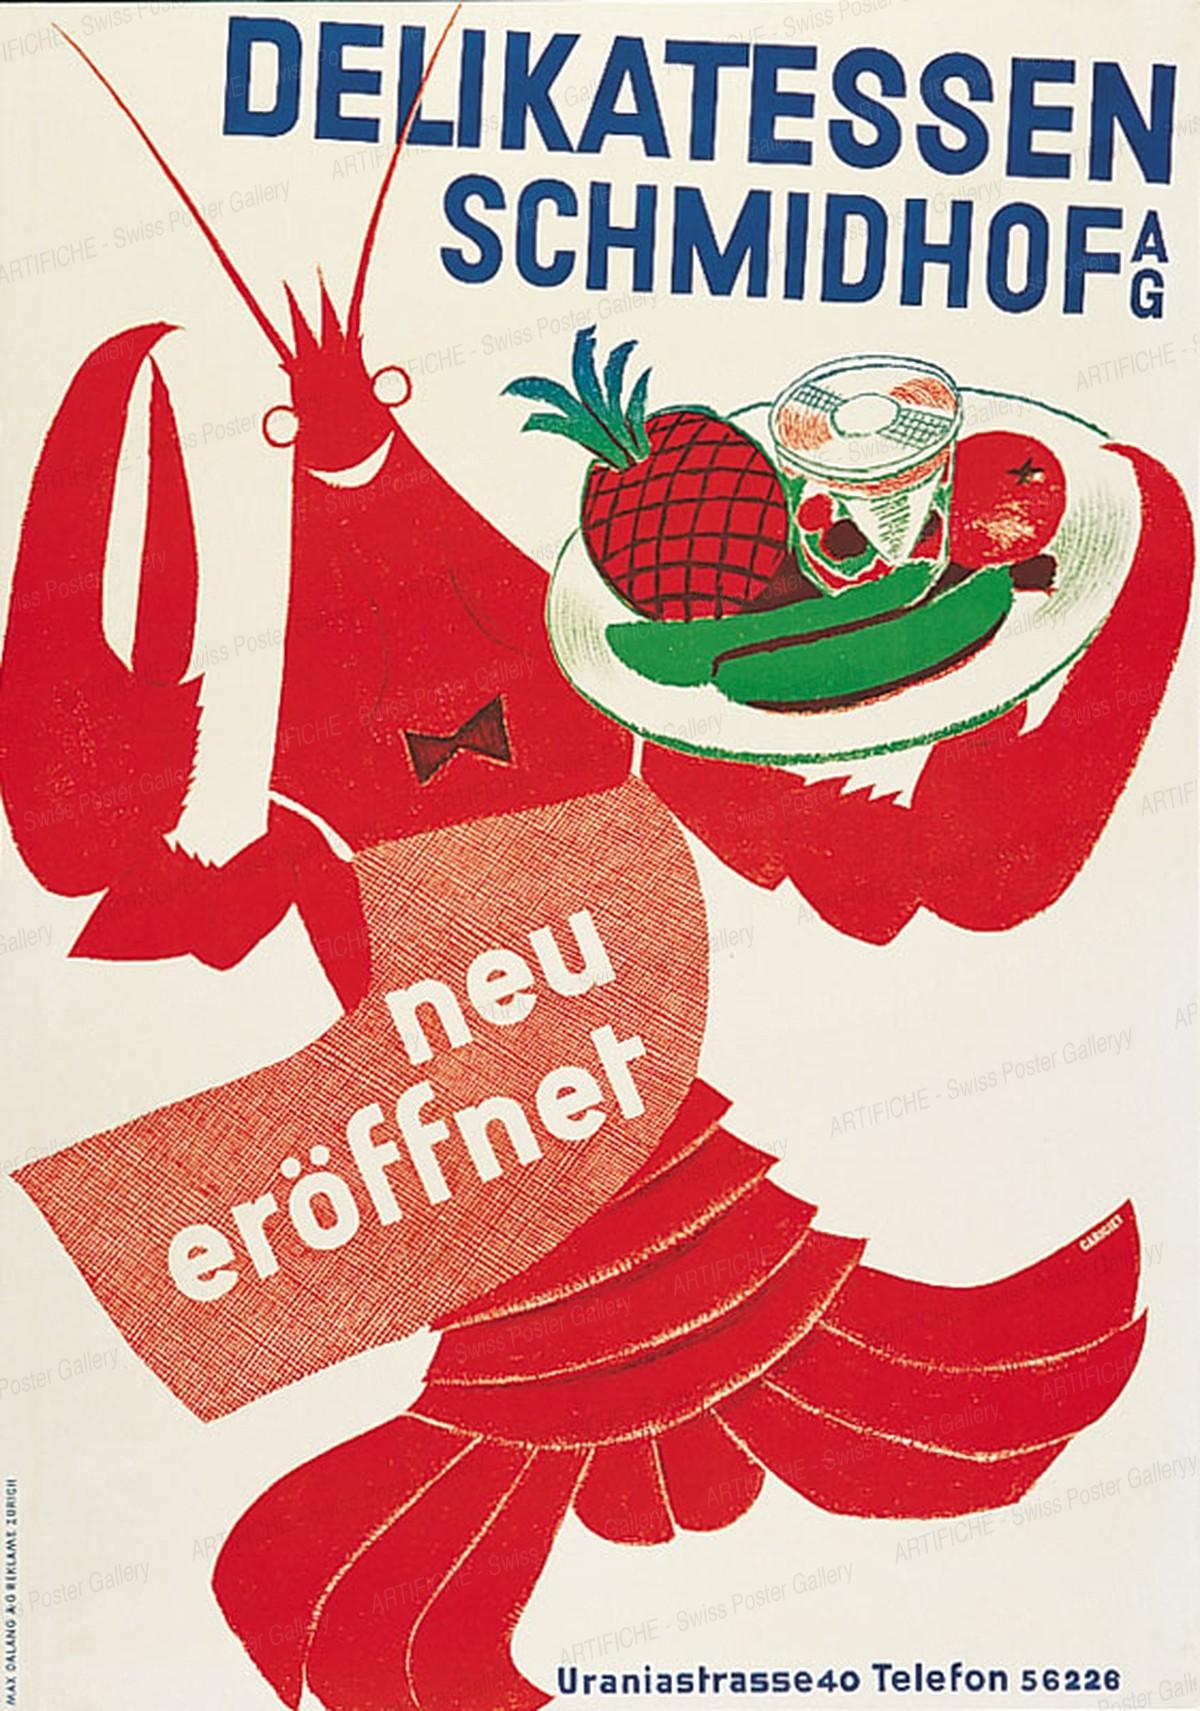 Delicacies Schmidhof AG – new opening, Alois Carigiet